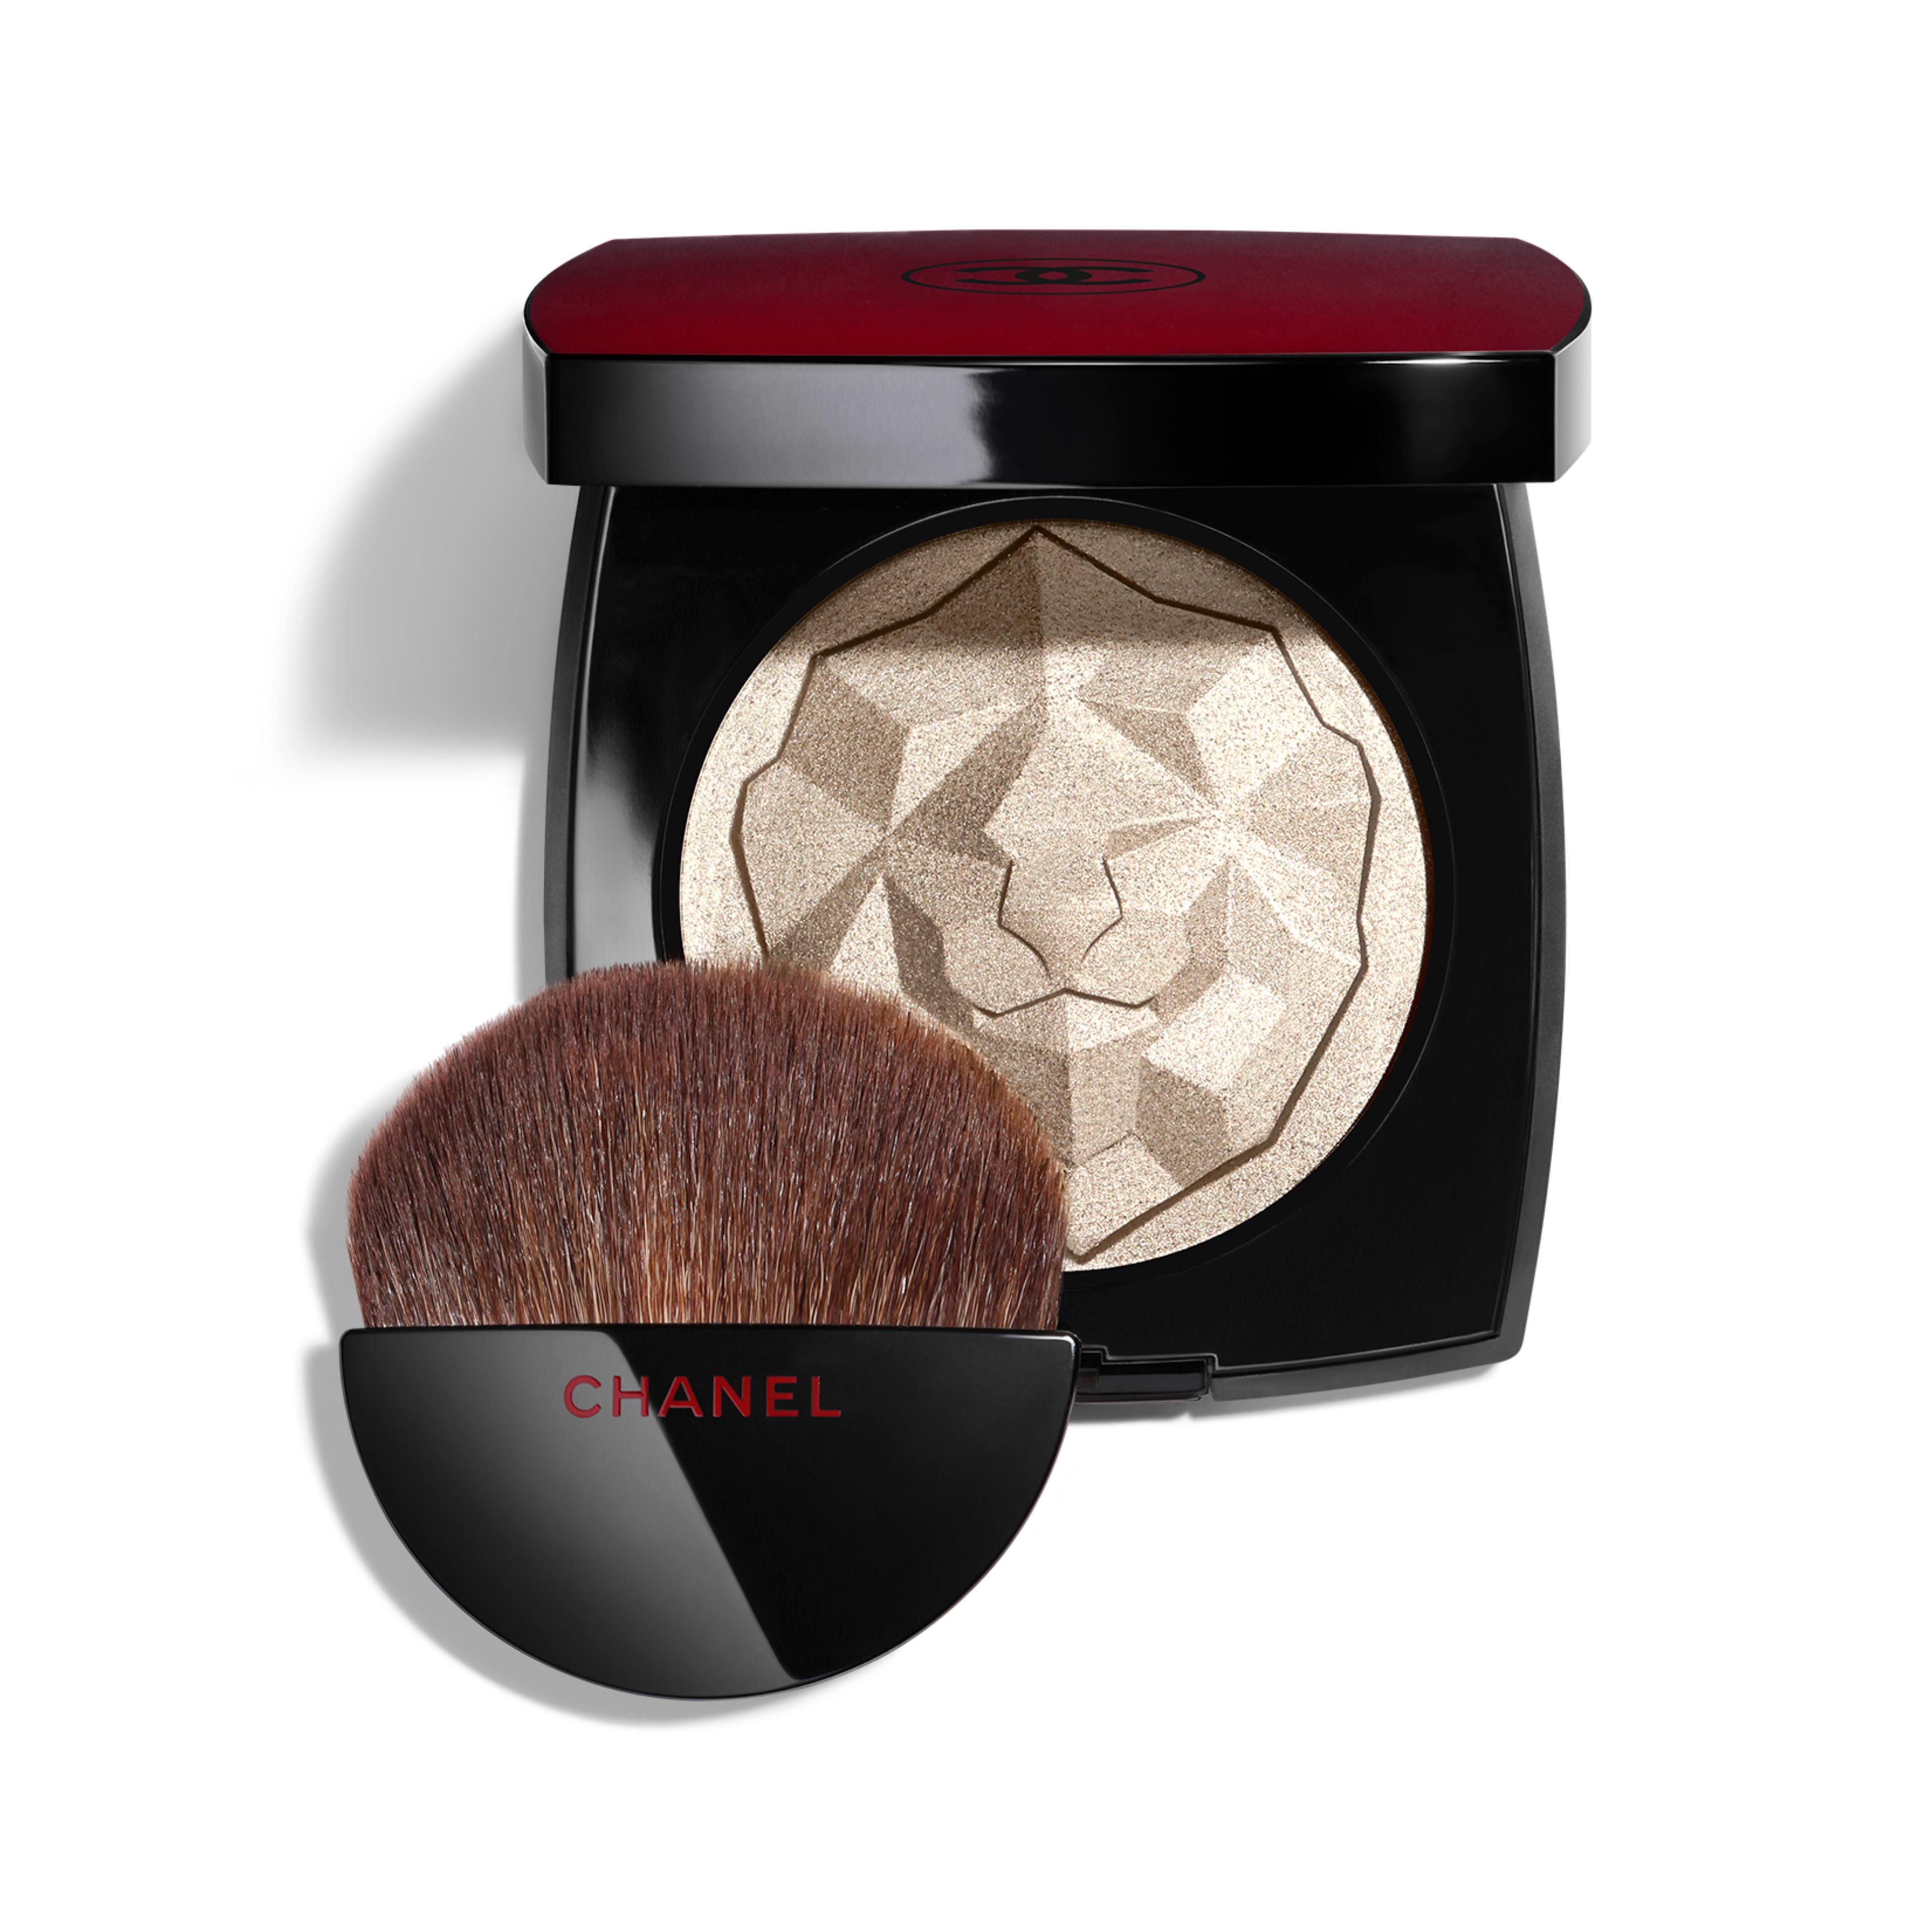 d87698158851 POUDRE À LÈVRES Lip Balm And Powder Duo 410 - ROSSO POMPEIANO | CHANEL